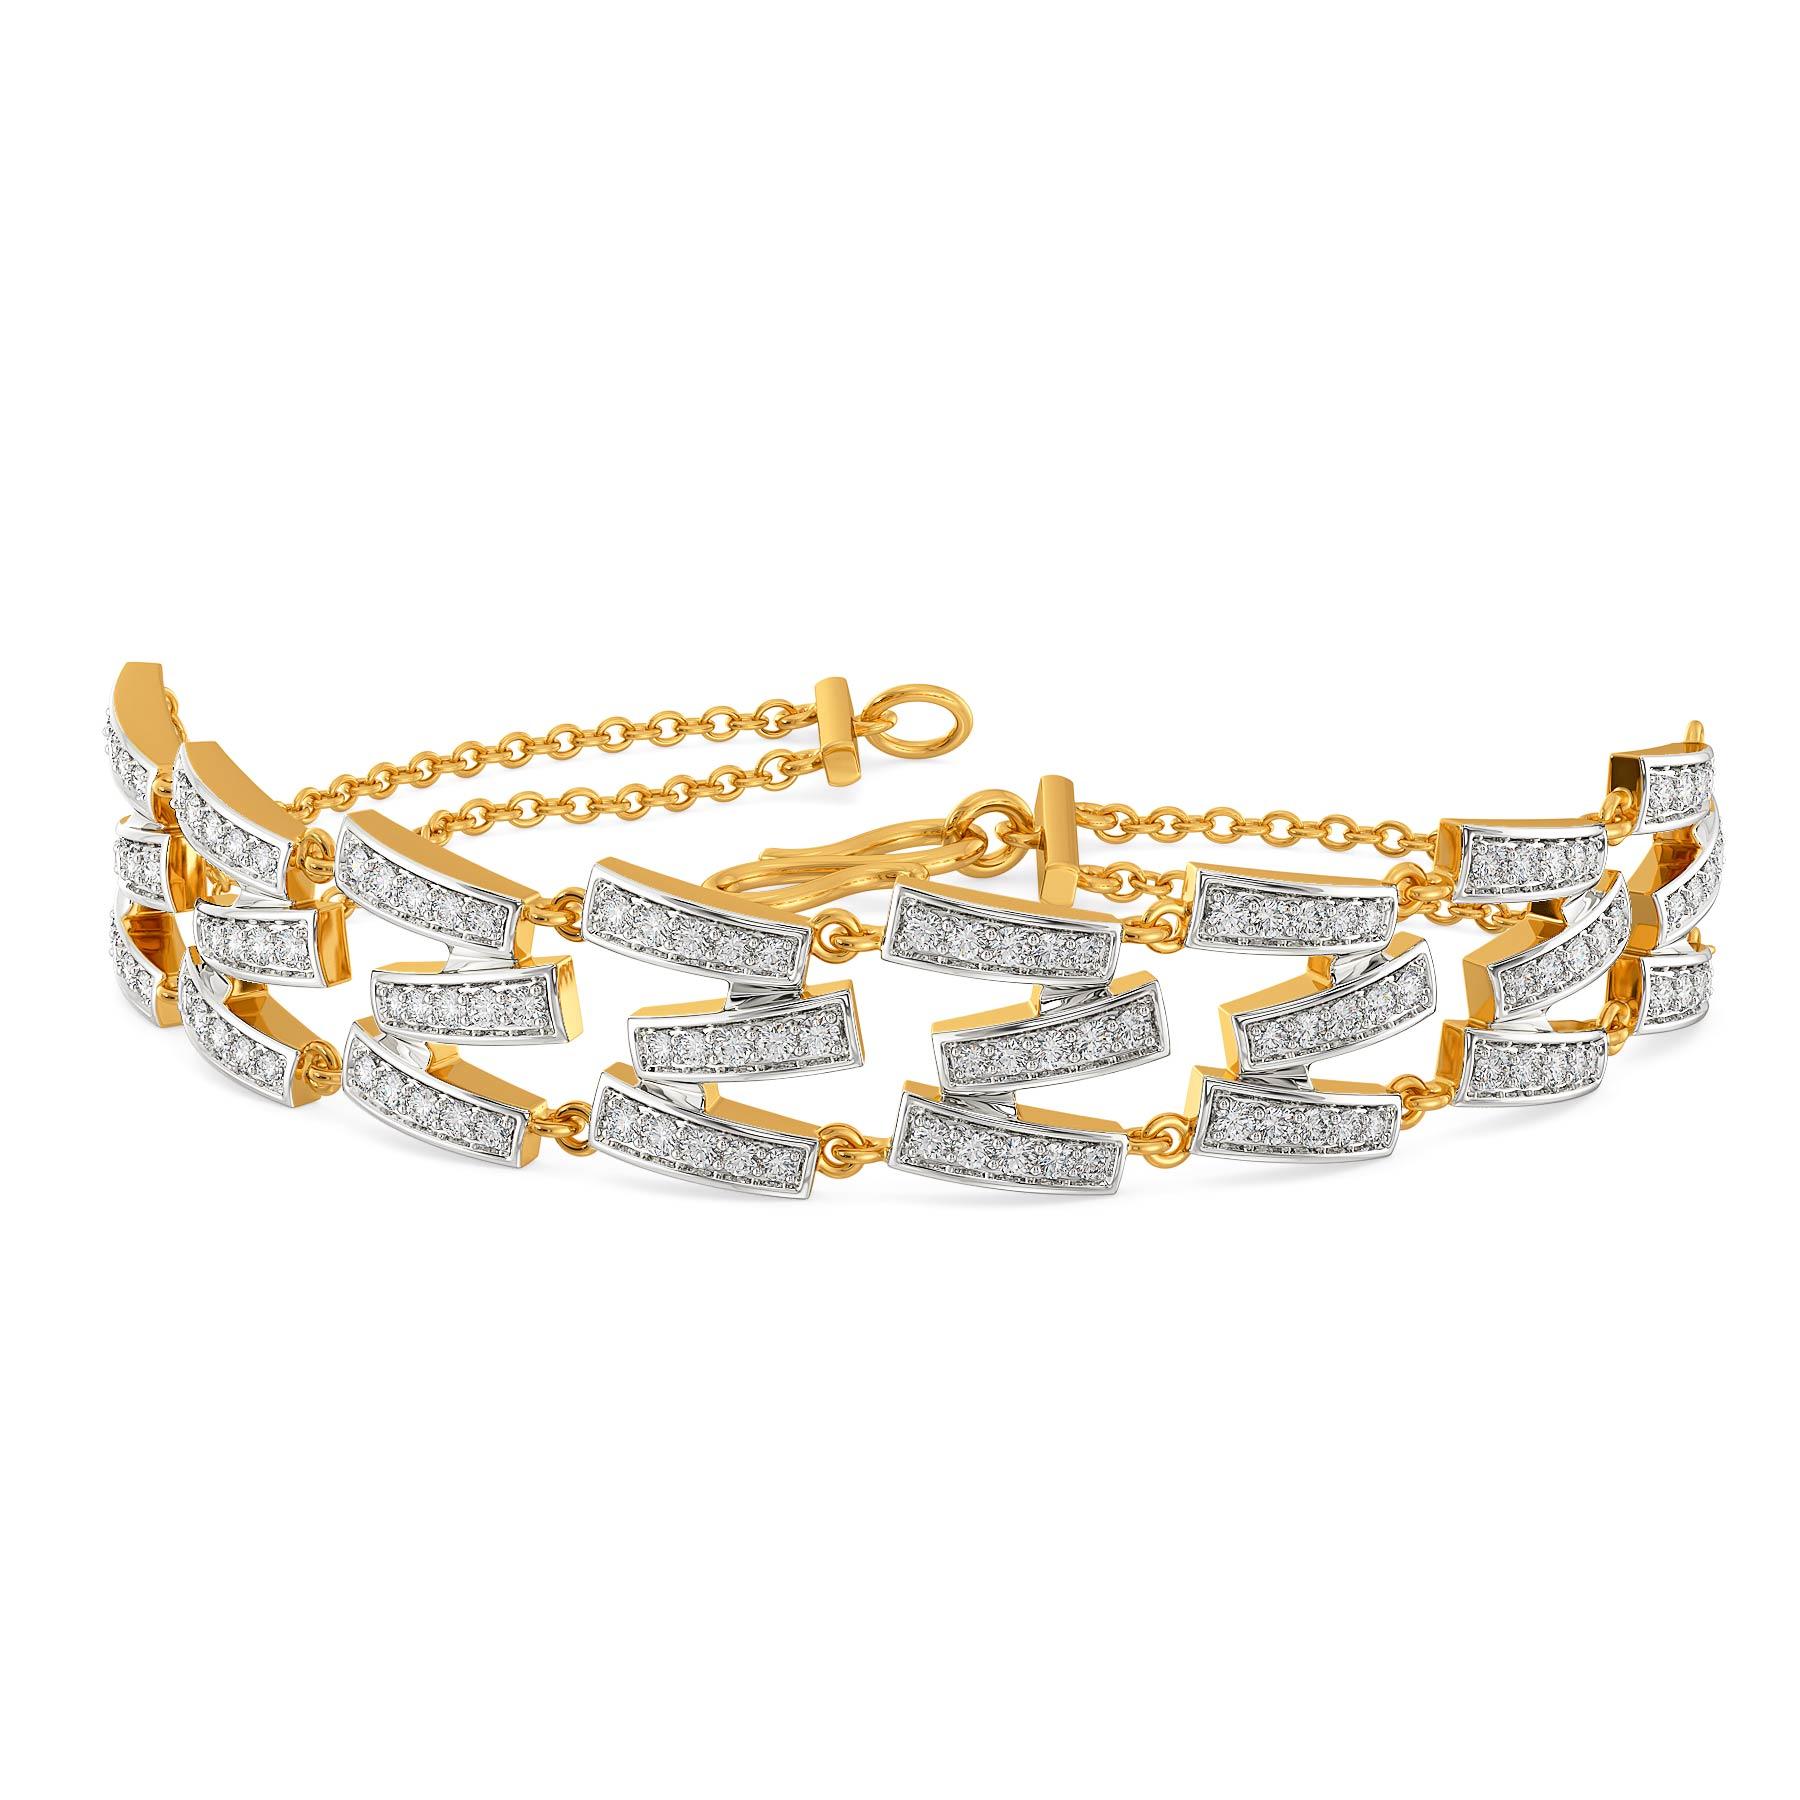 Tilt Shift Diamond Bracelets